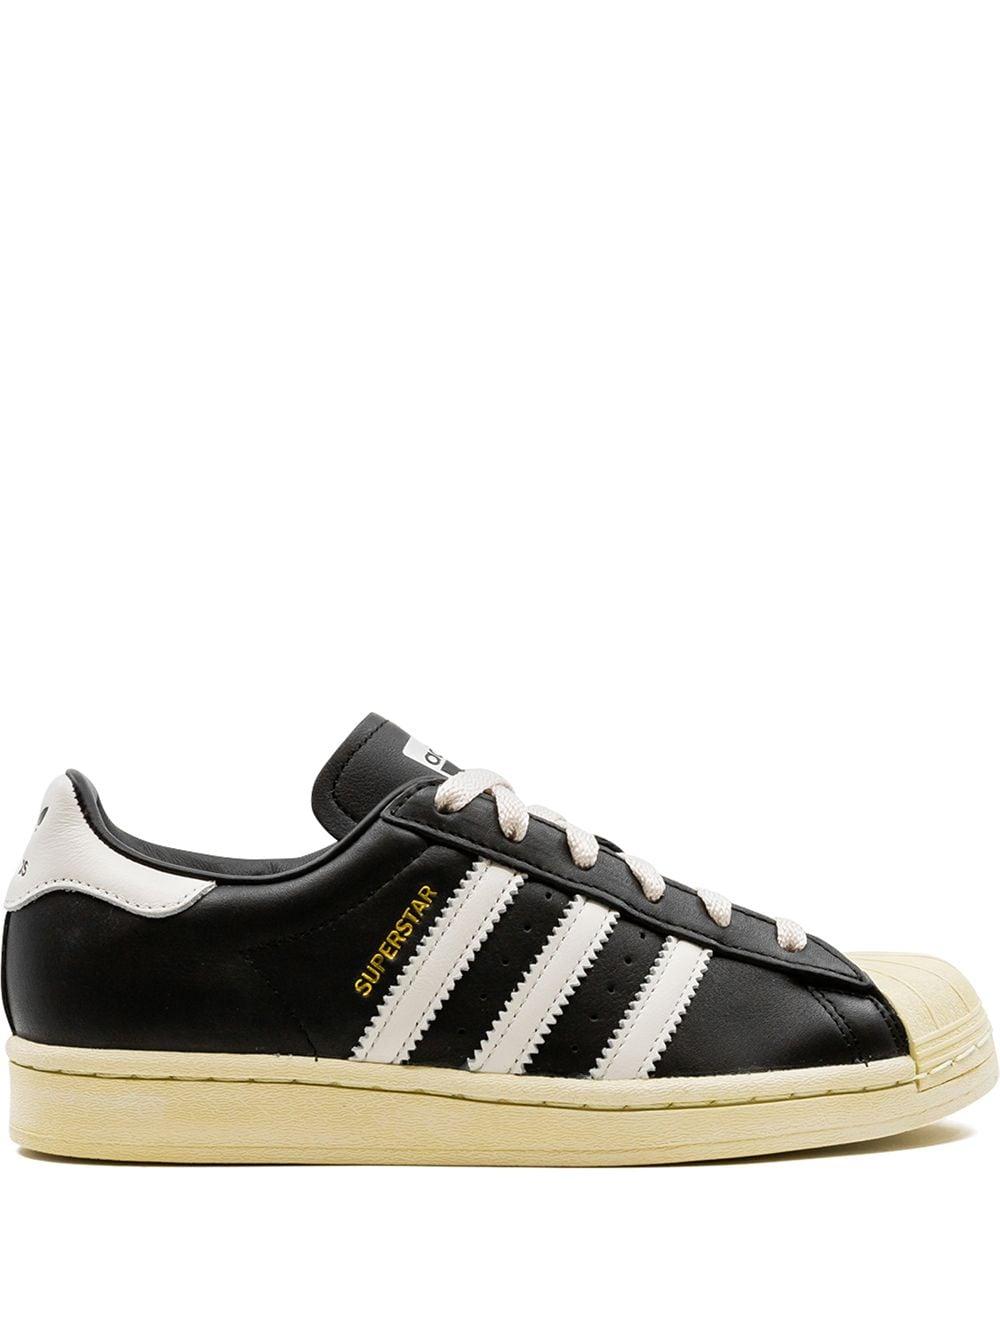 ADIDAS- Adidas Sneakers Black- Man- 7½ - Black